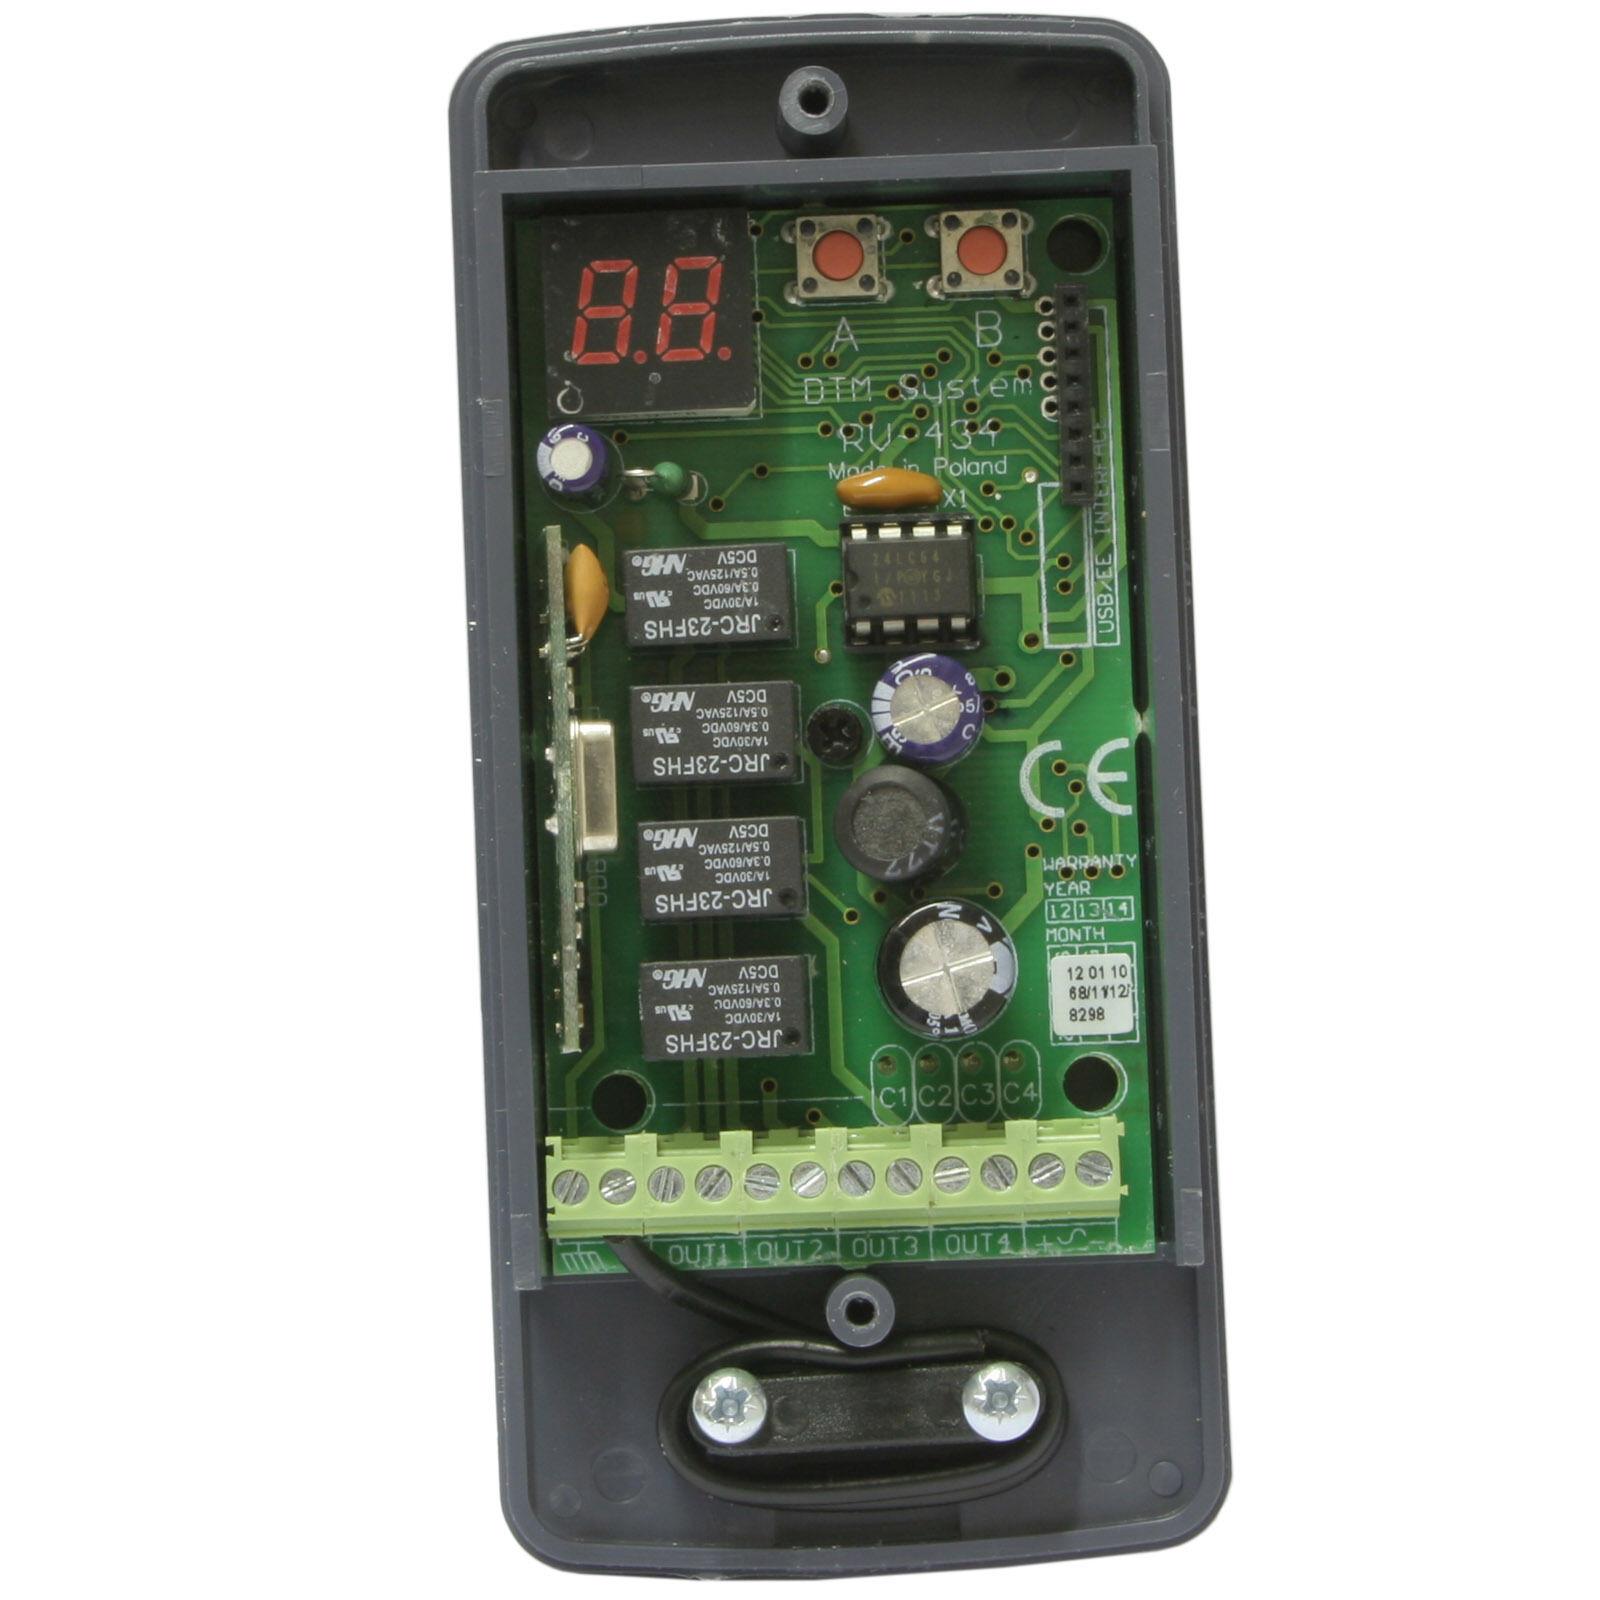 Funkempfänger universal 4-Kanal RV Receiver 433,92 MHz Keeloq Tore